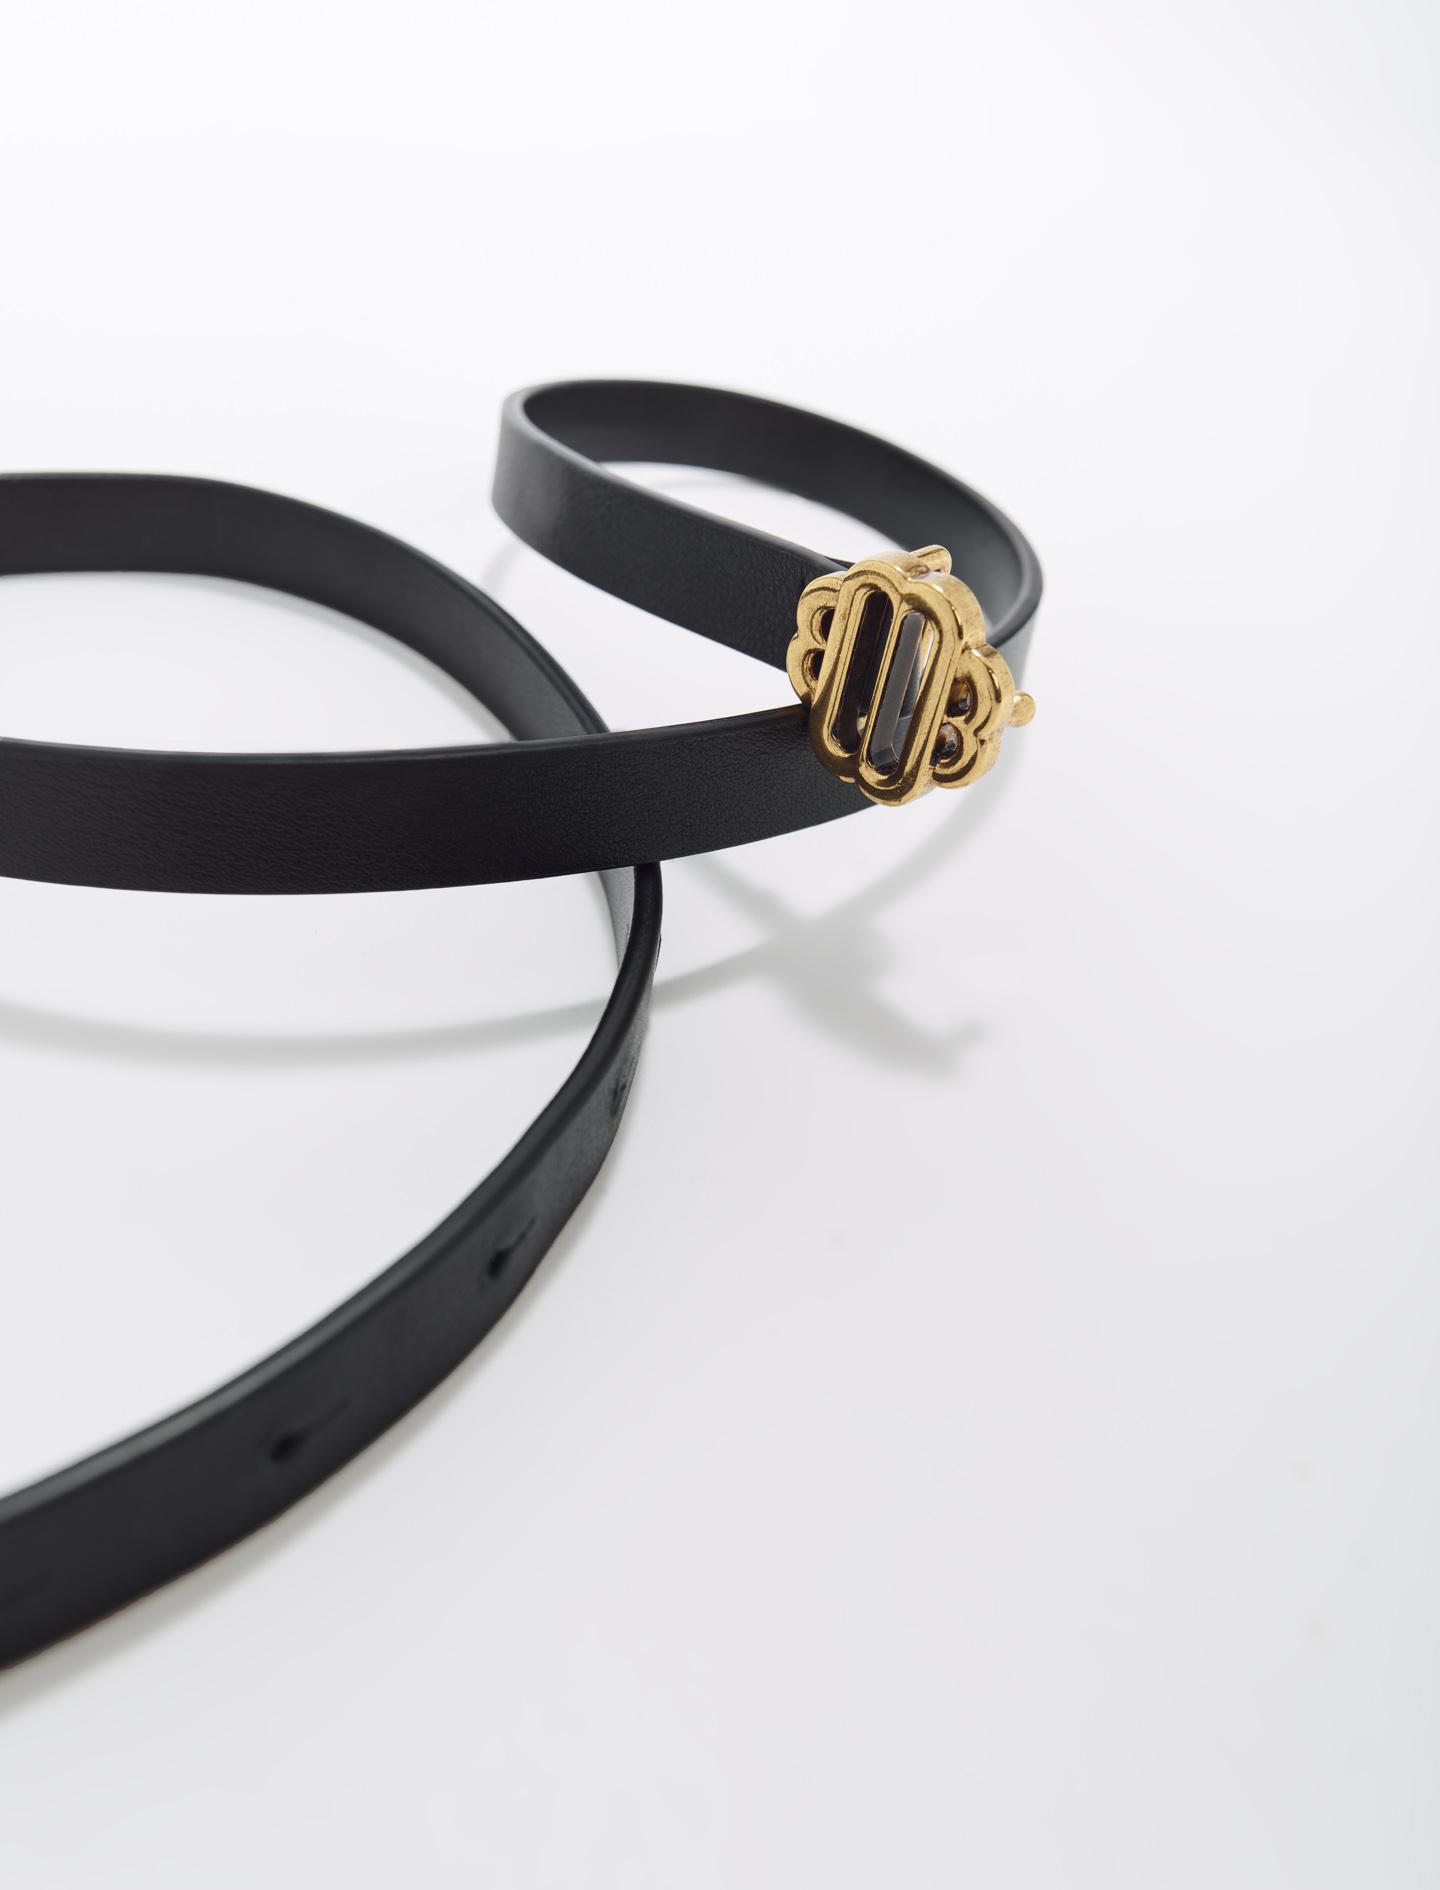 Narrow Black Leather Belt Gold Buckle - Black